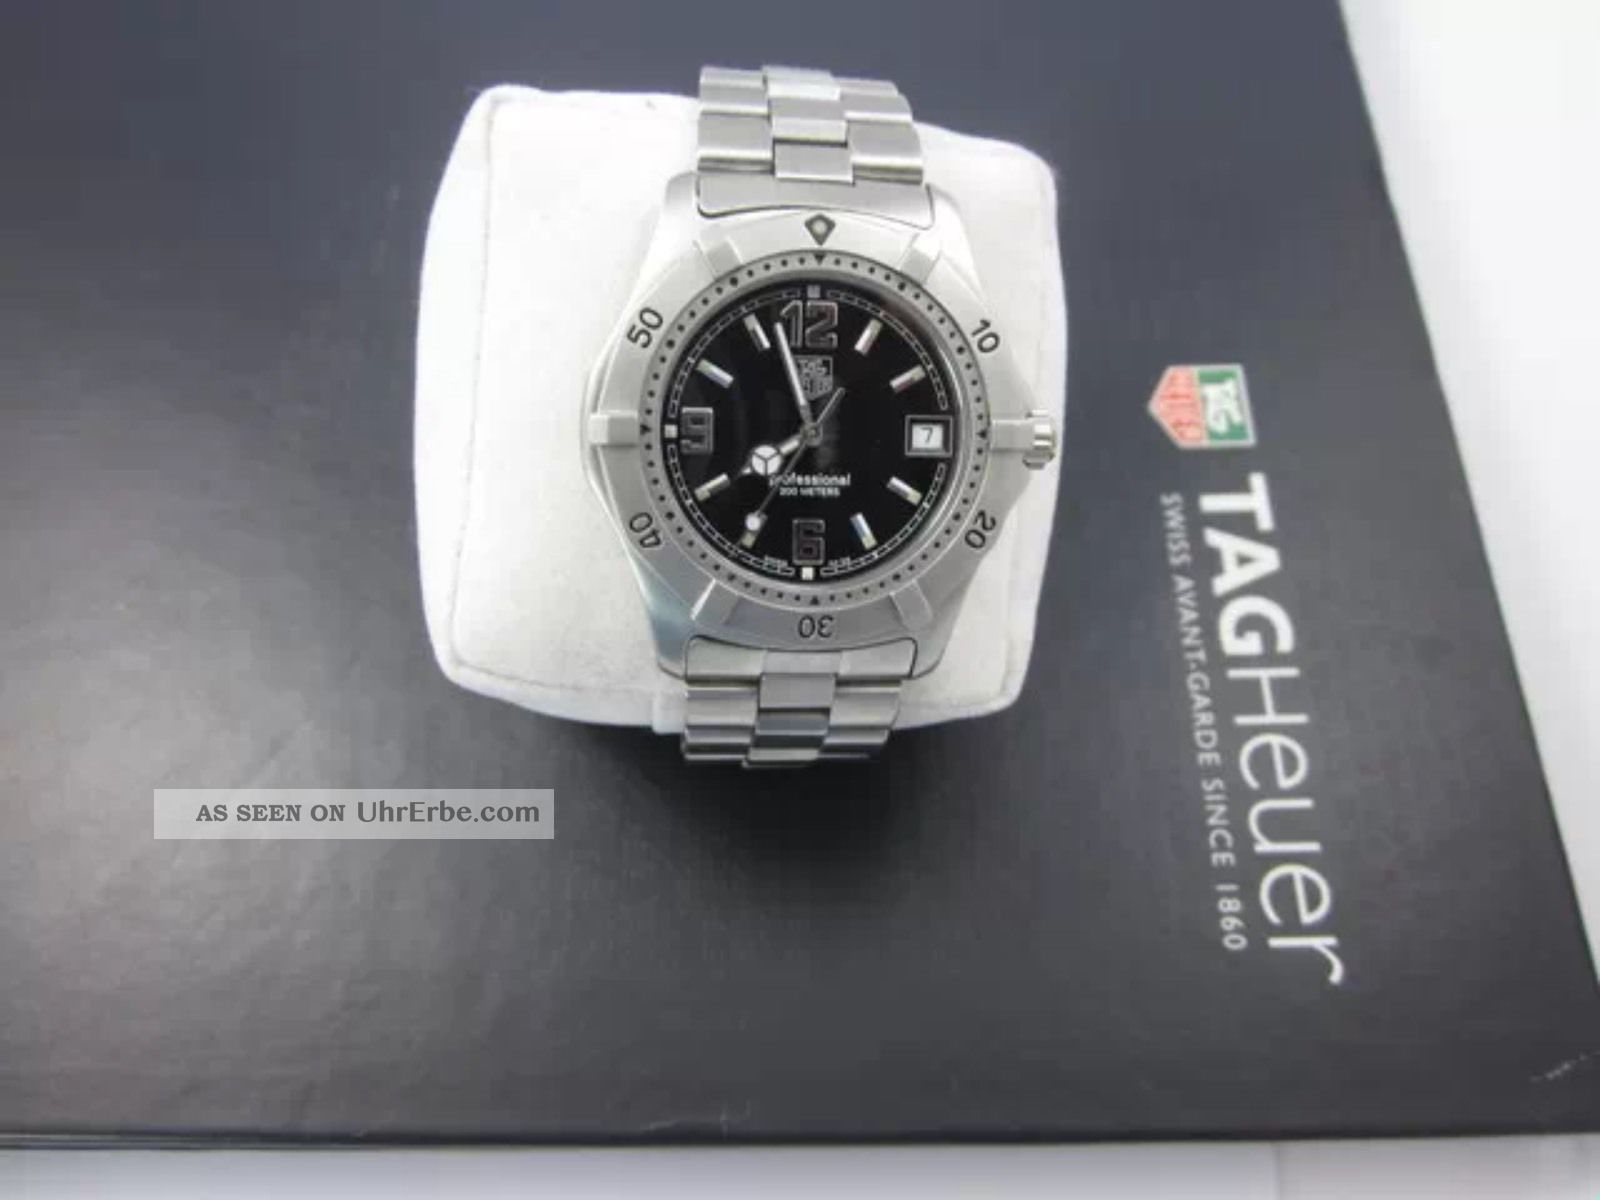 Tag Heuer 2000 Hau Mit Schwarzem Zifferblatt Wk 1110 Armbanduhren Bild